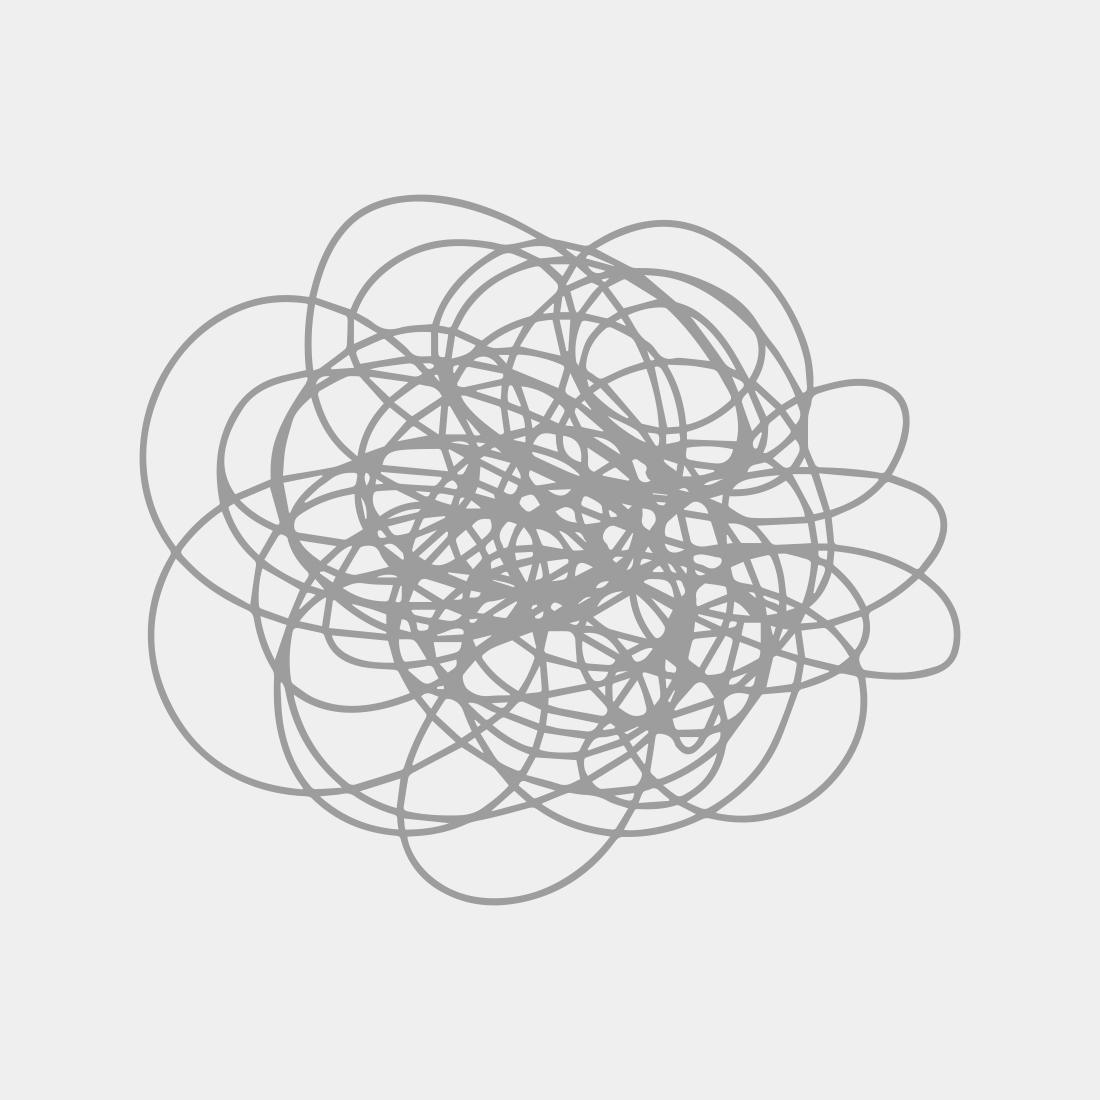 Jock McFadyen Special Edition